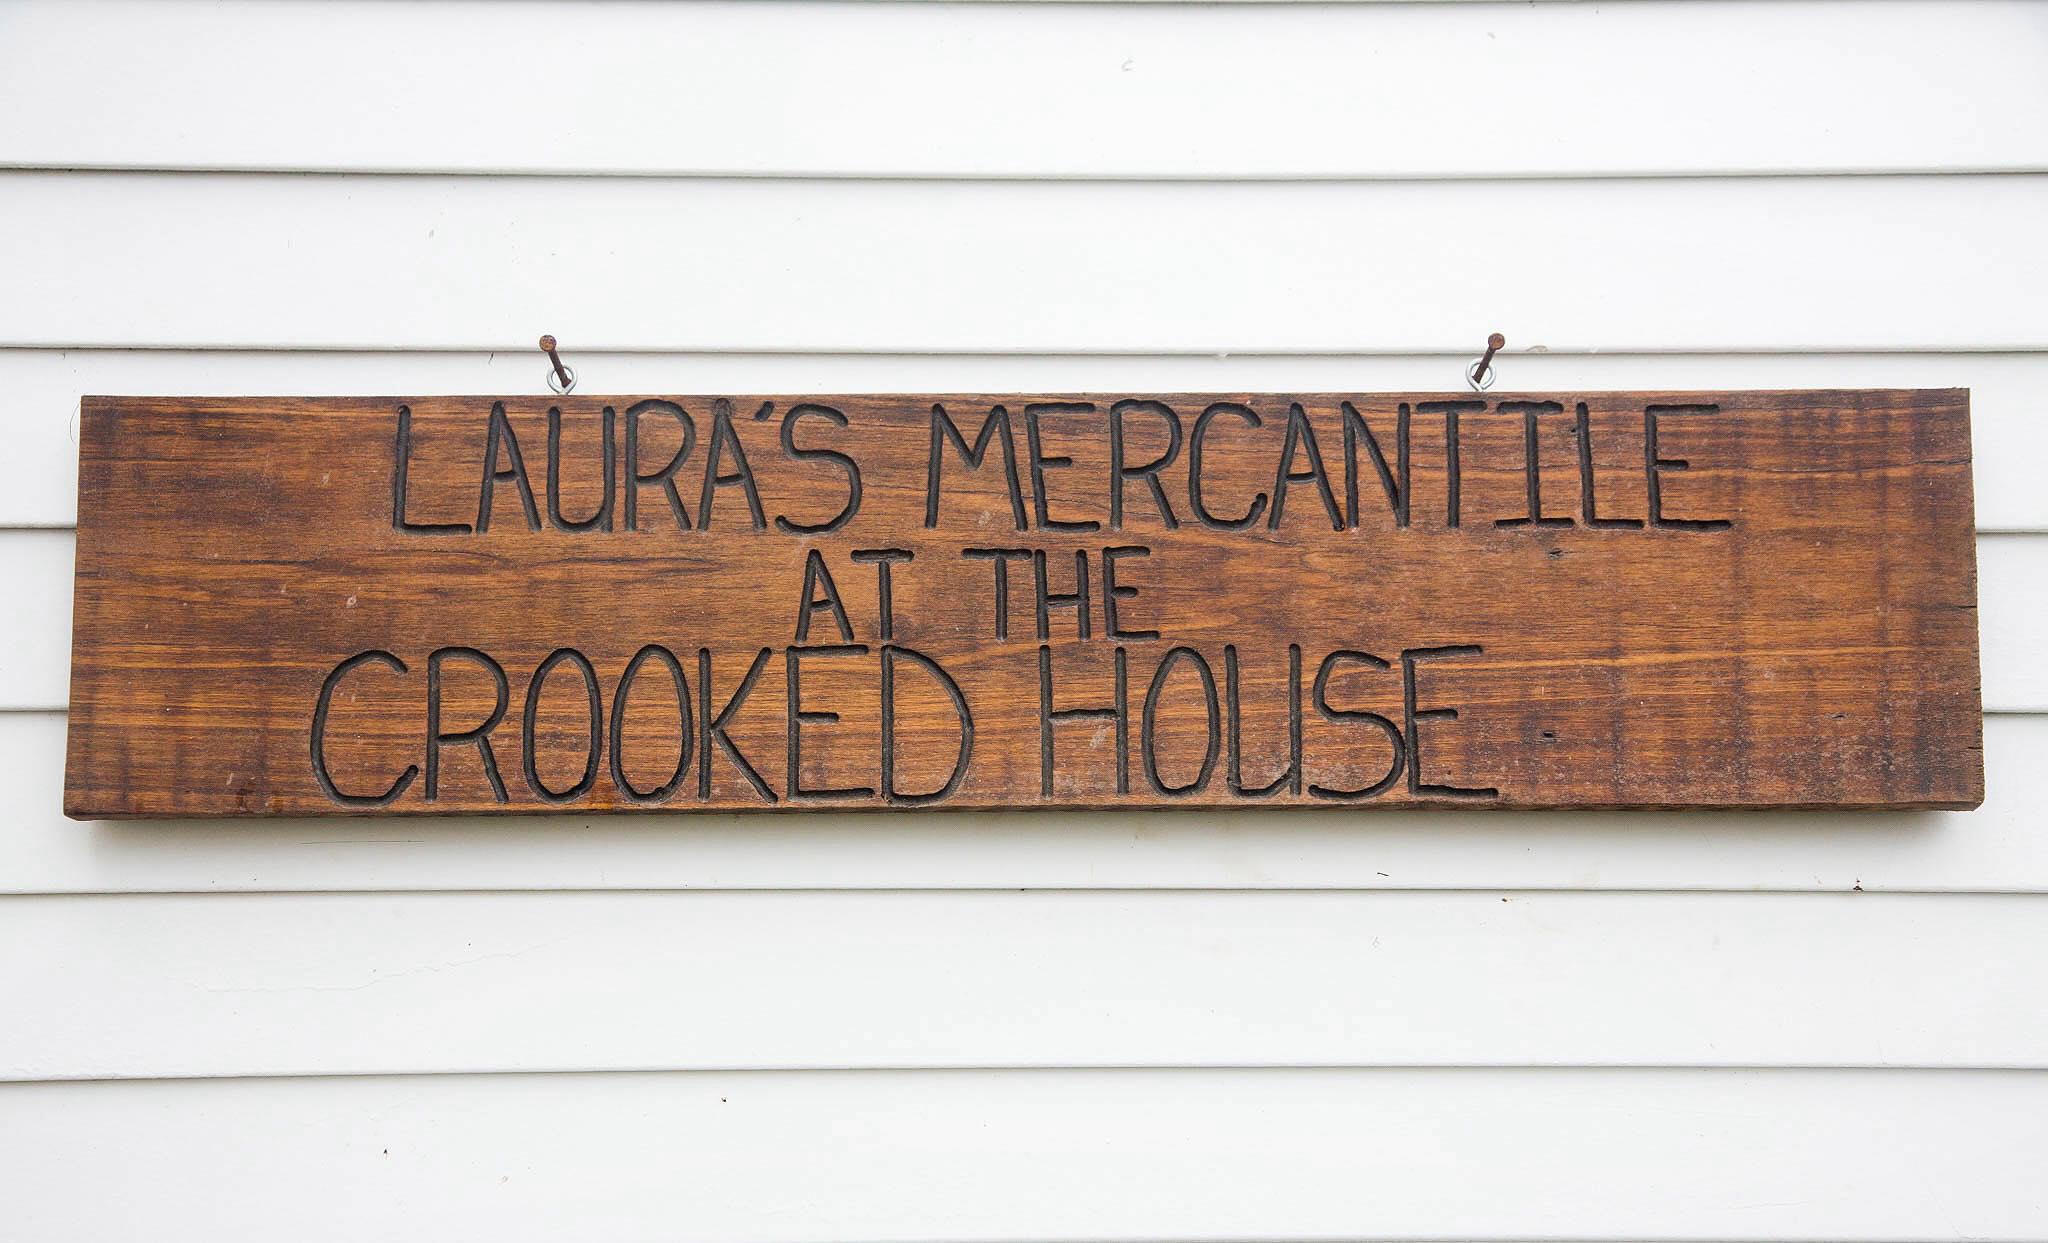 Banner image for CBD store: Laura's Mercantile